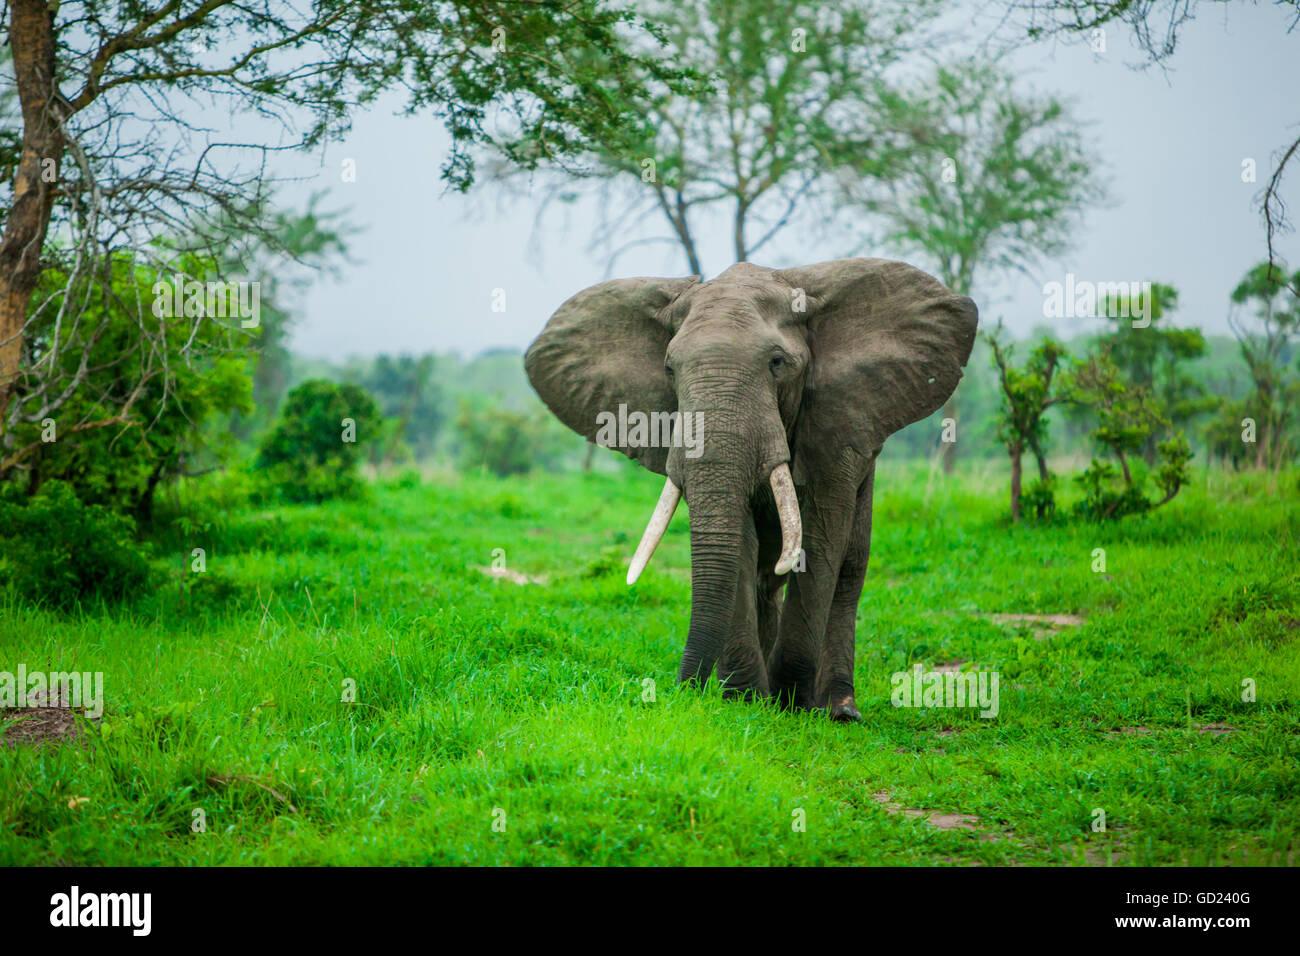 Elephant on safari, Mizumi Safari Park, Tanzania, East Africa, Africa - Stock Image